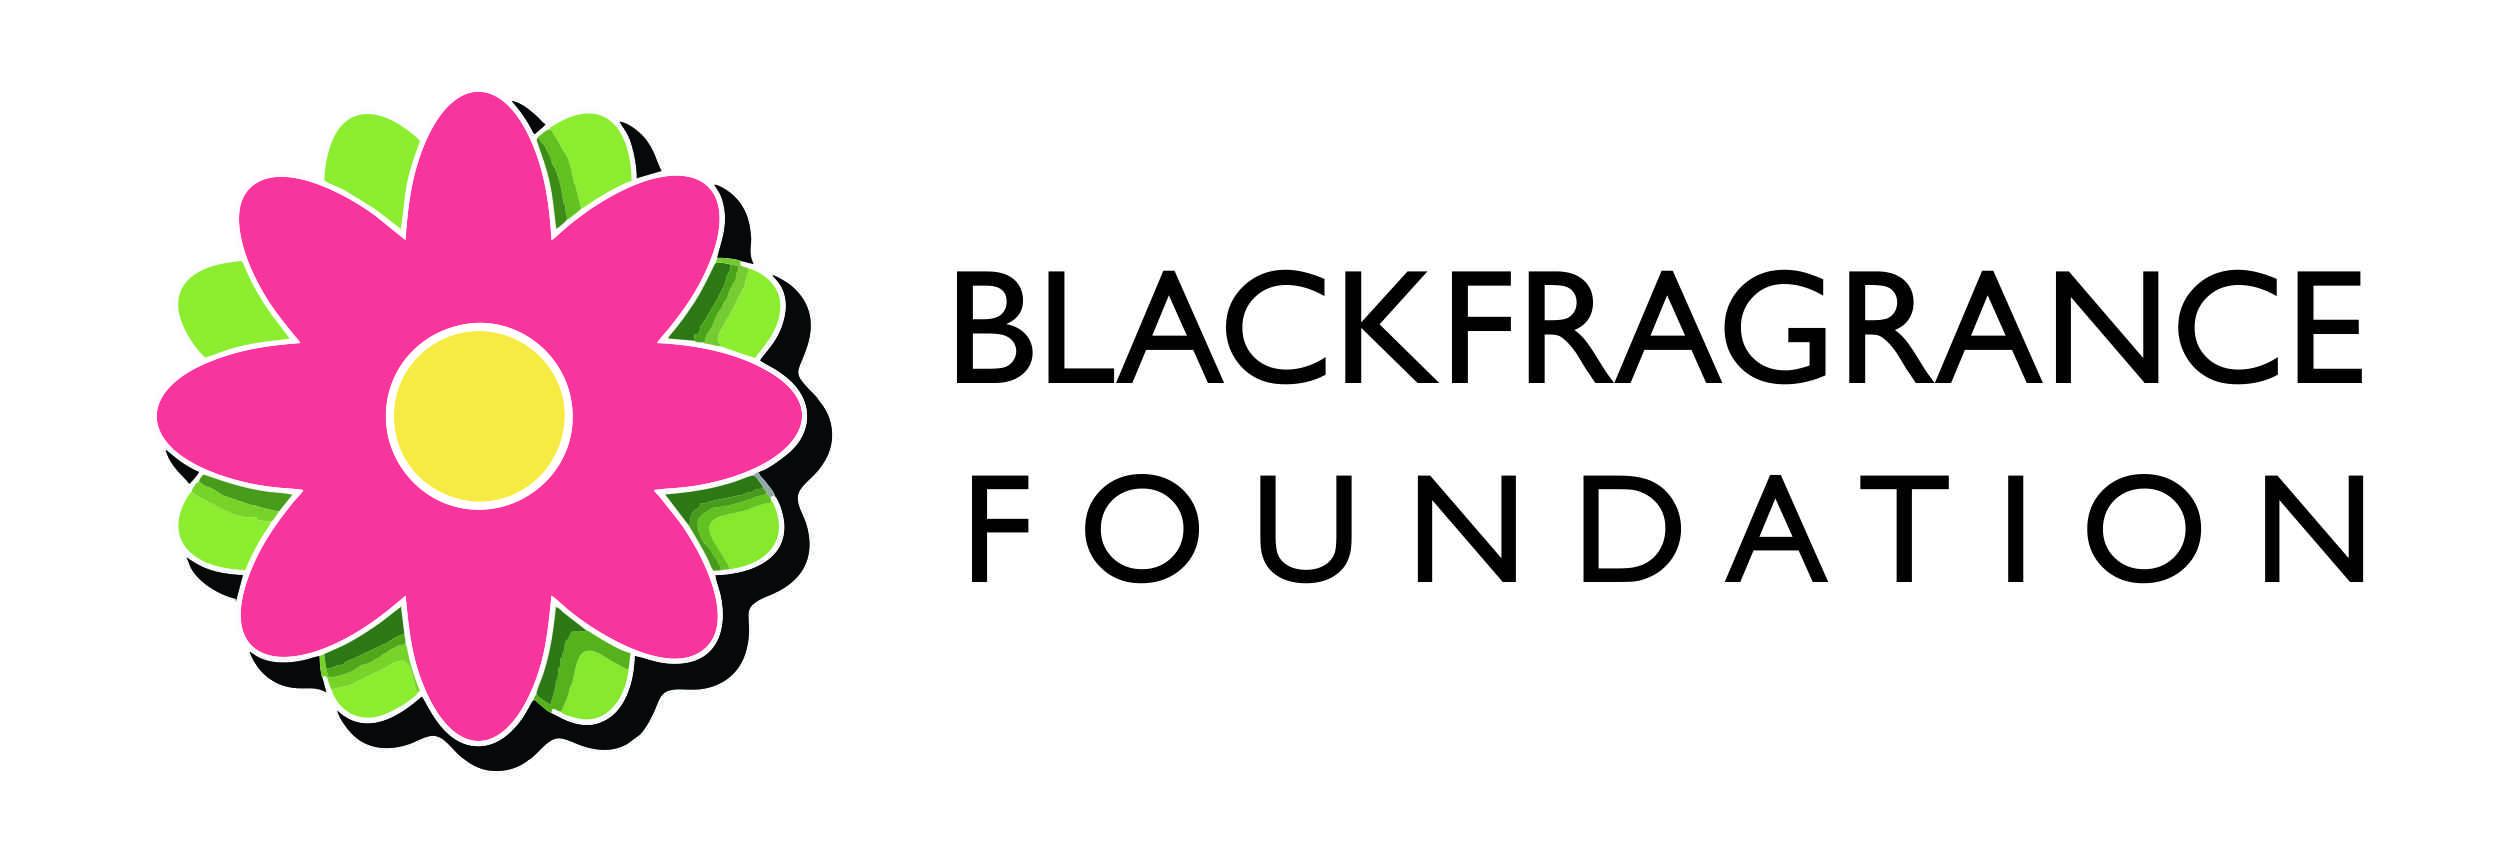 BLACKFRAGRANCE FOUNDATION